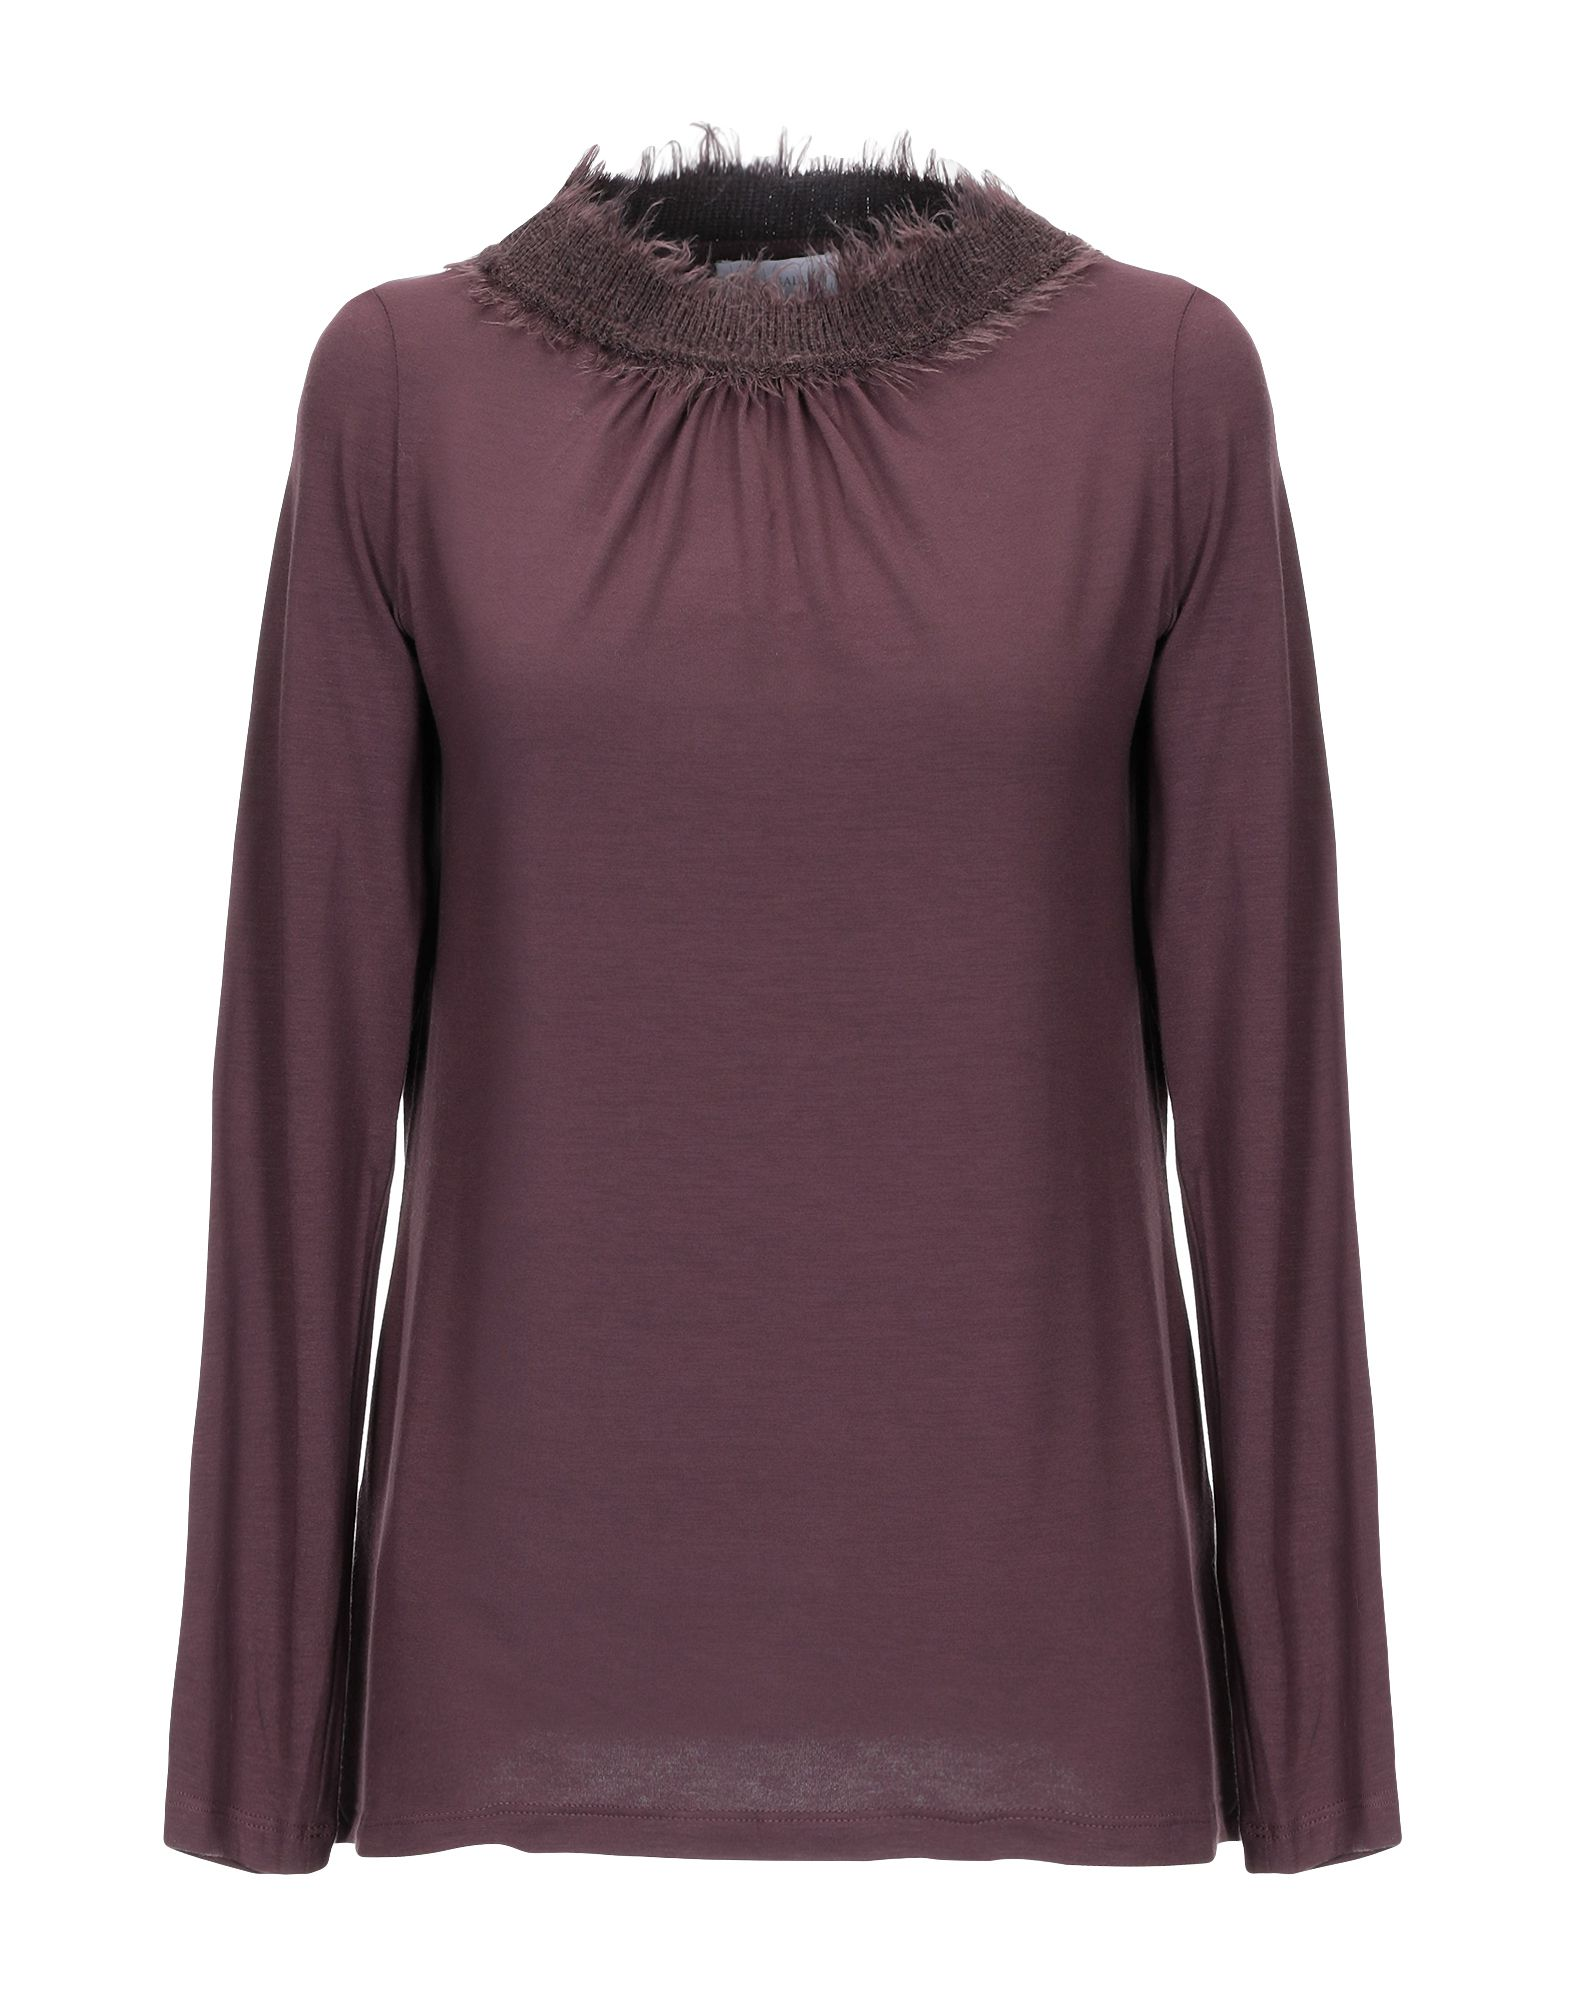 T-Shirt Diana Gallesi donna - 12307572BB 12307572BB 12307572BB b7a